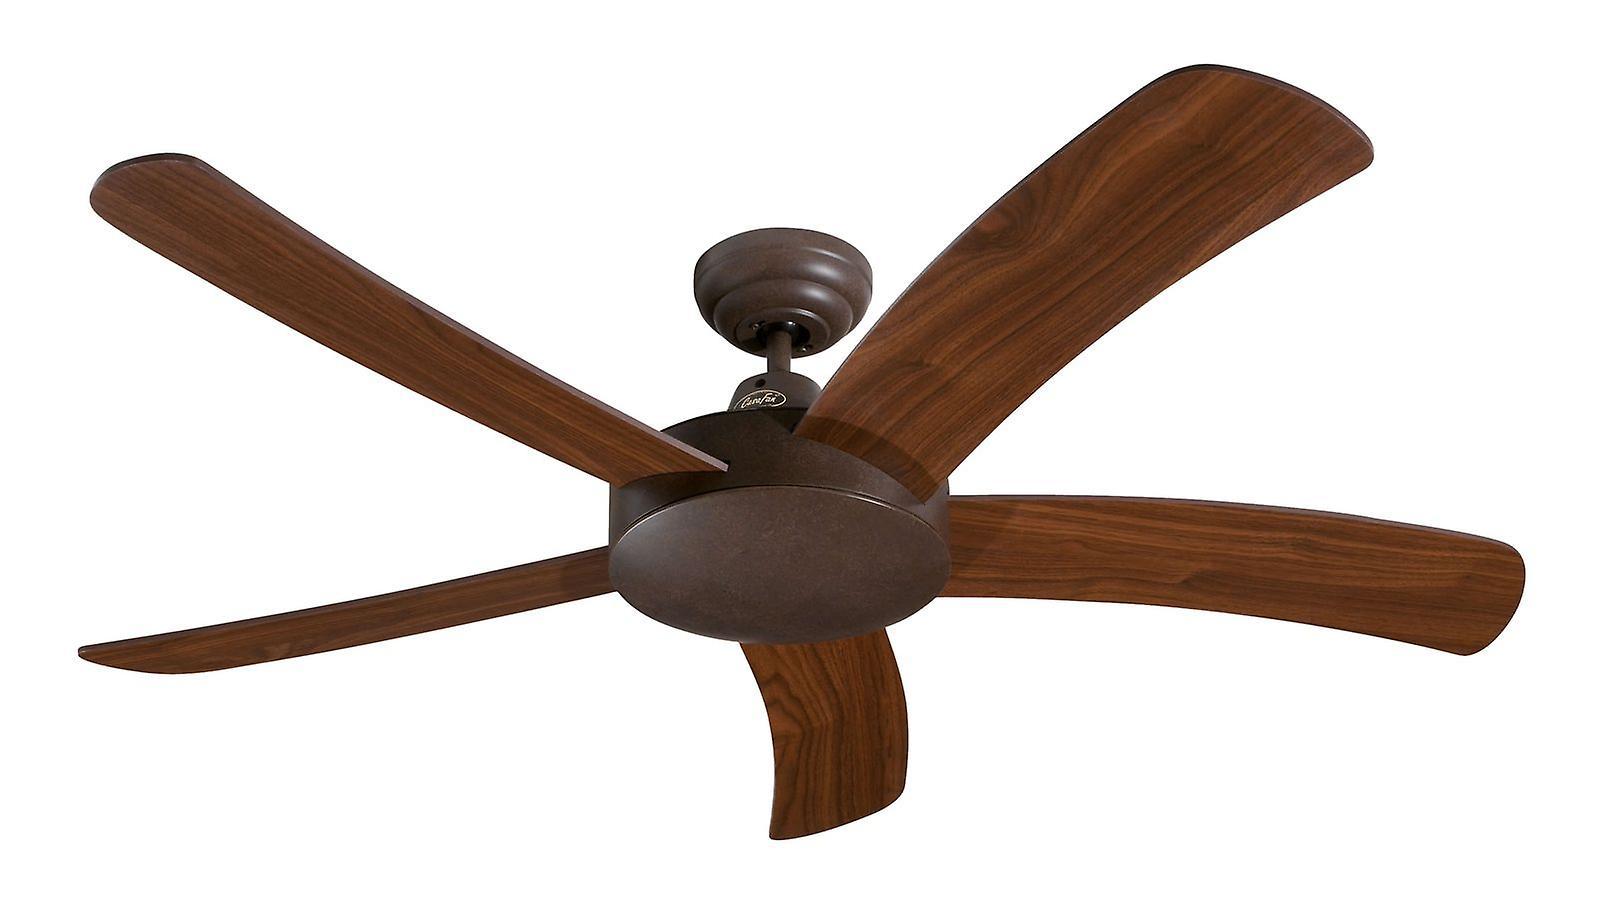 Ceiling Fan FALCETTO marron 132cm   52& 034; without control